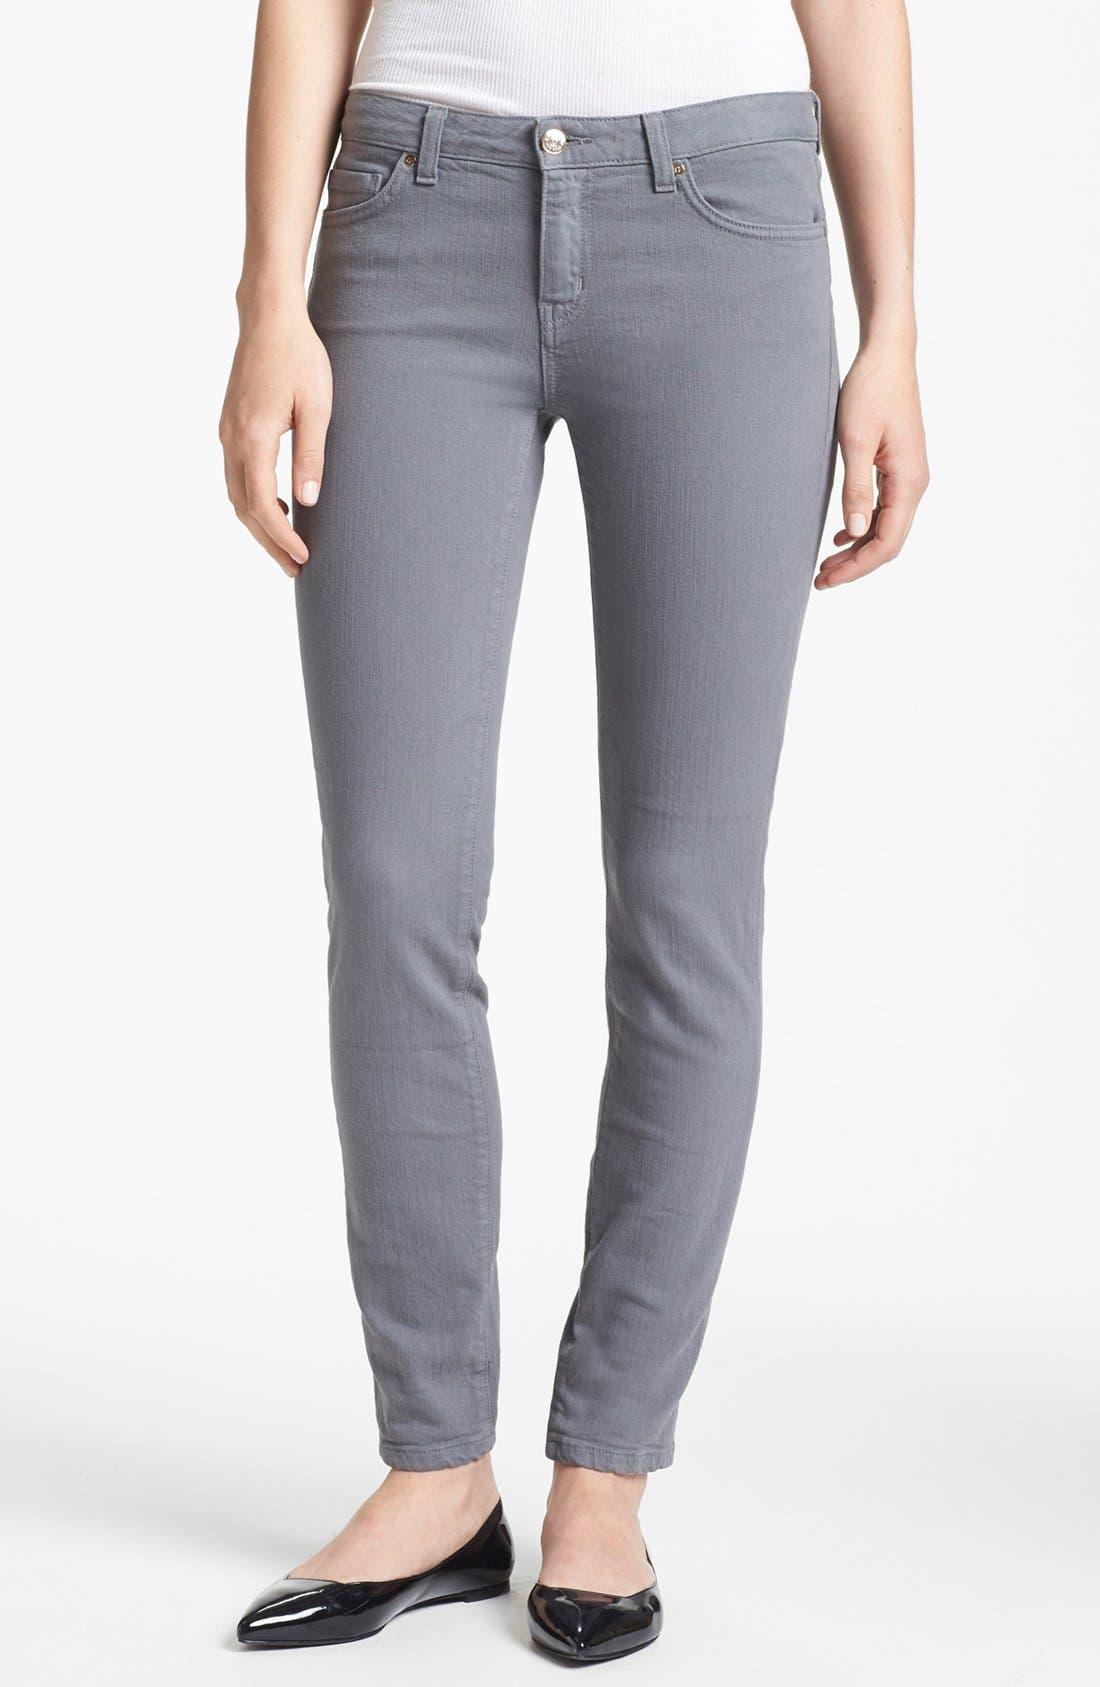 Main Image - kate spade new york 'broome street' overdyed skinny jeans (Medium Grey)